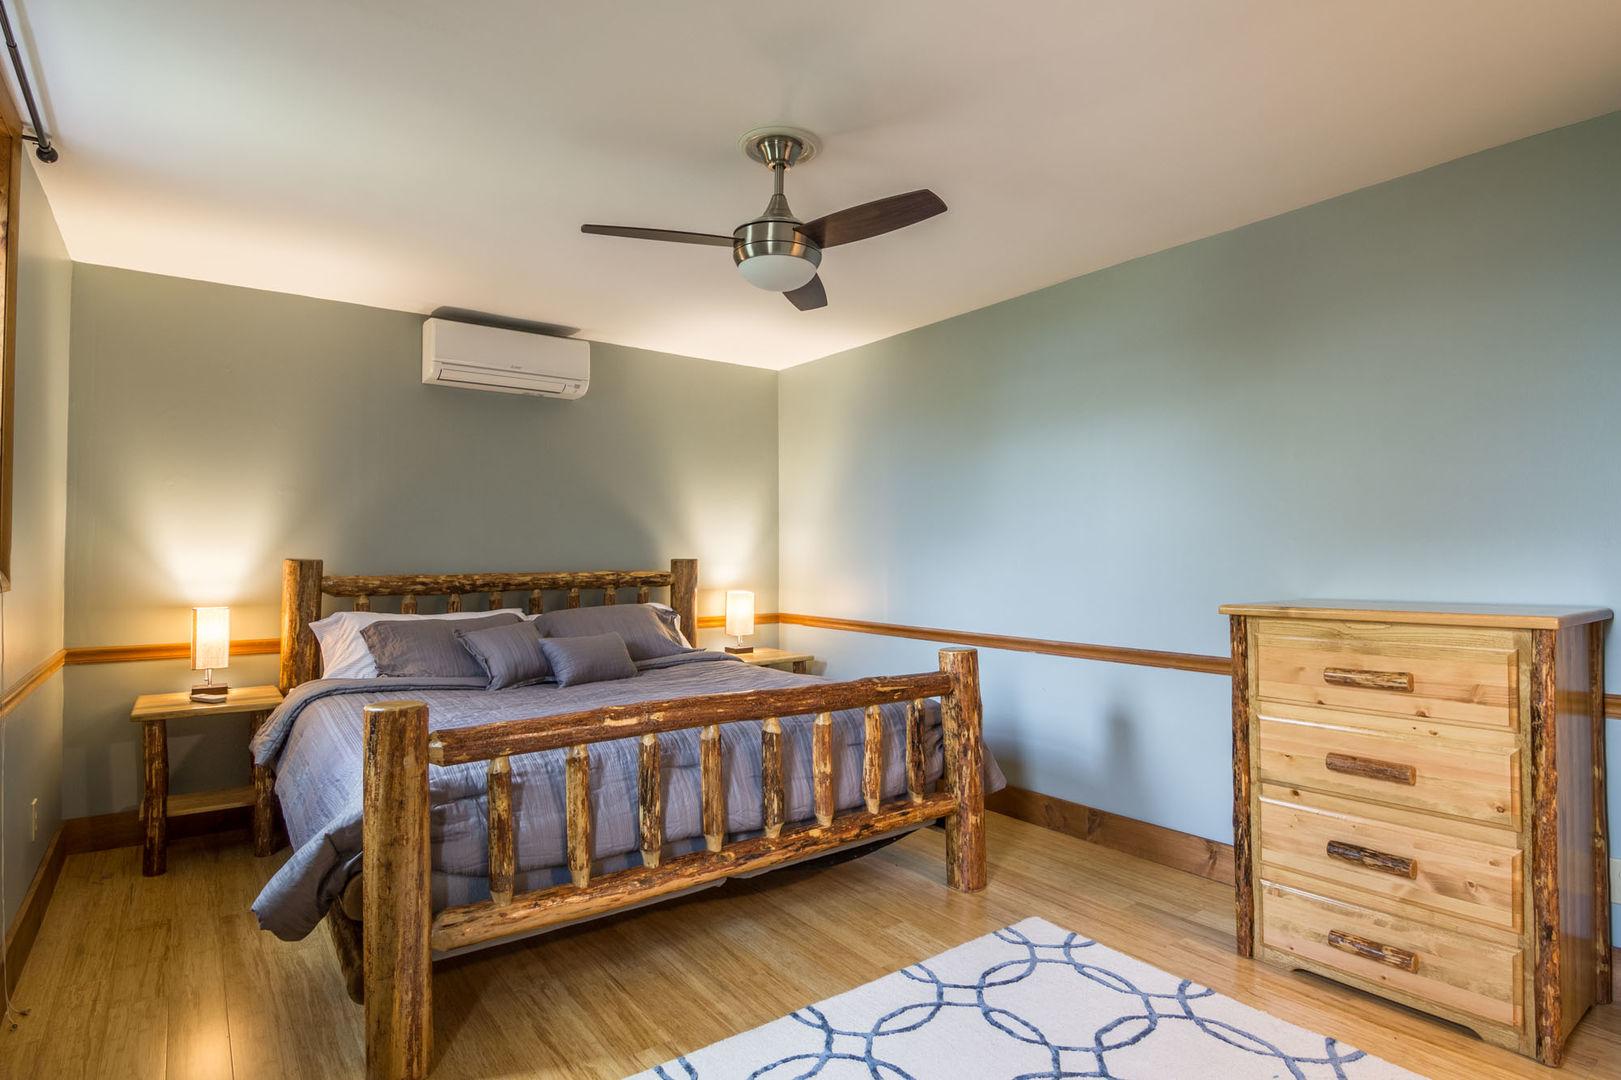 King sized bedroom